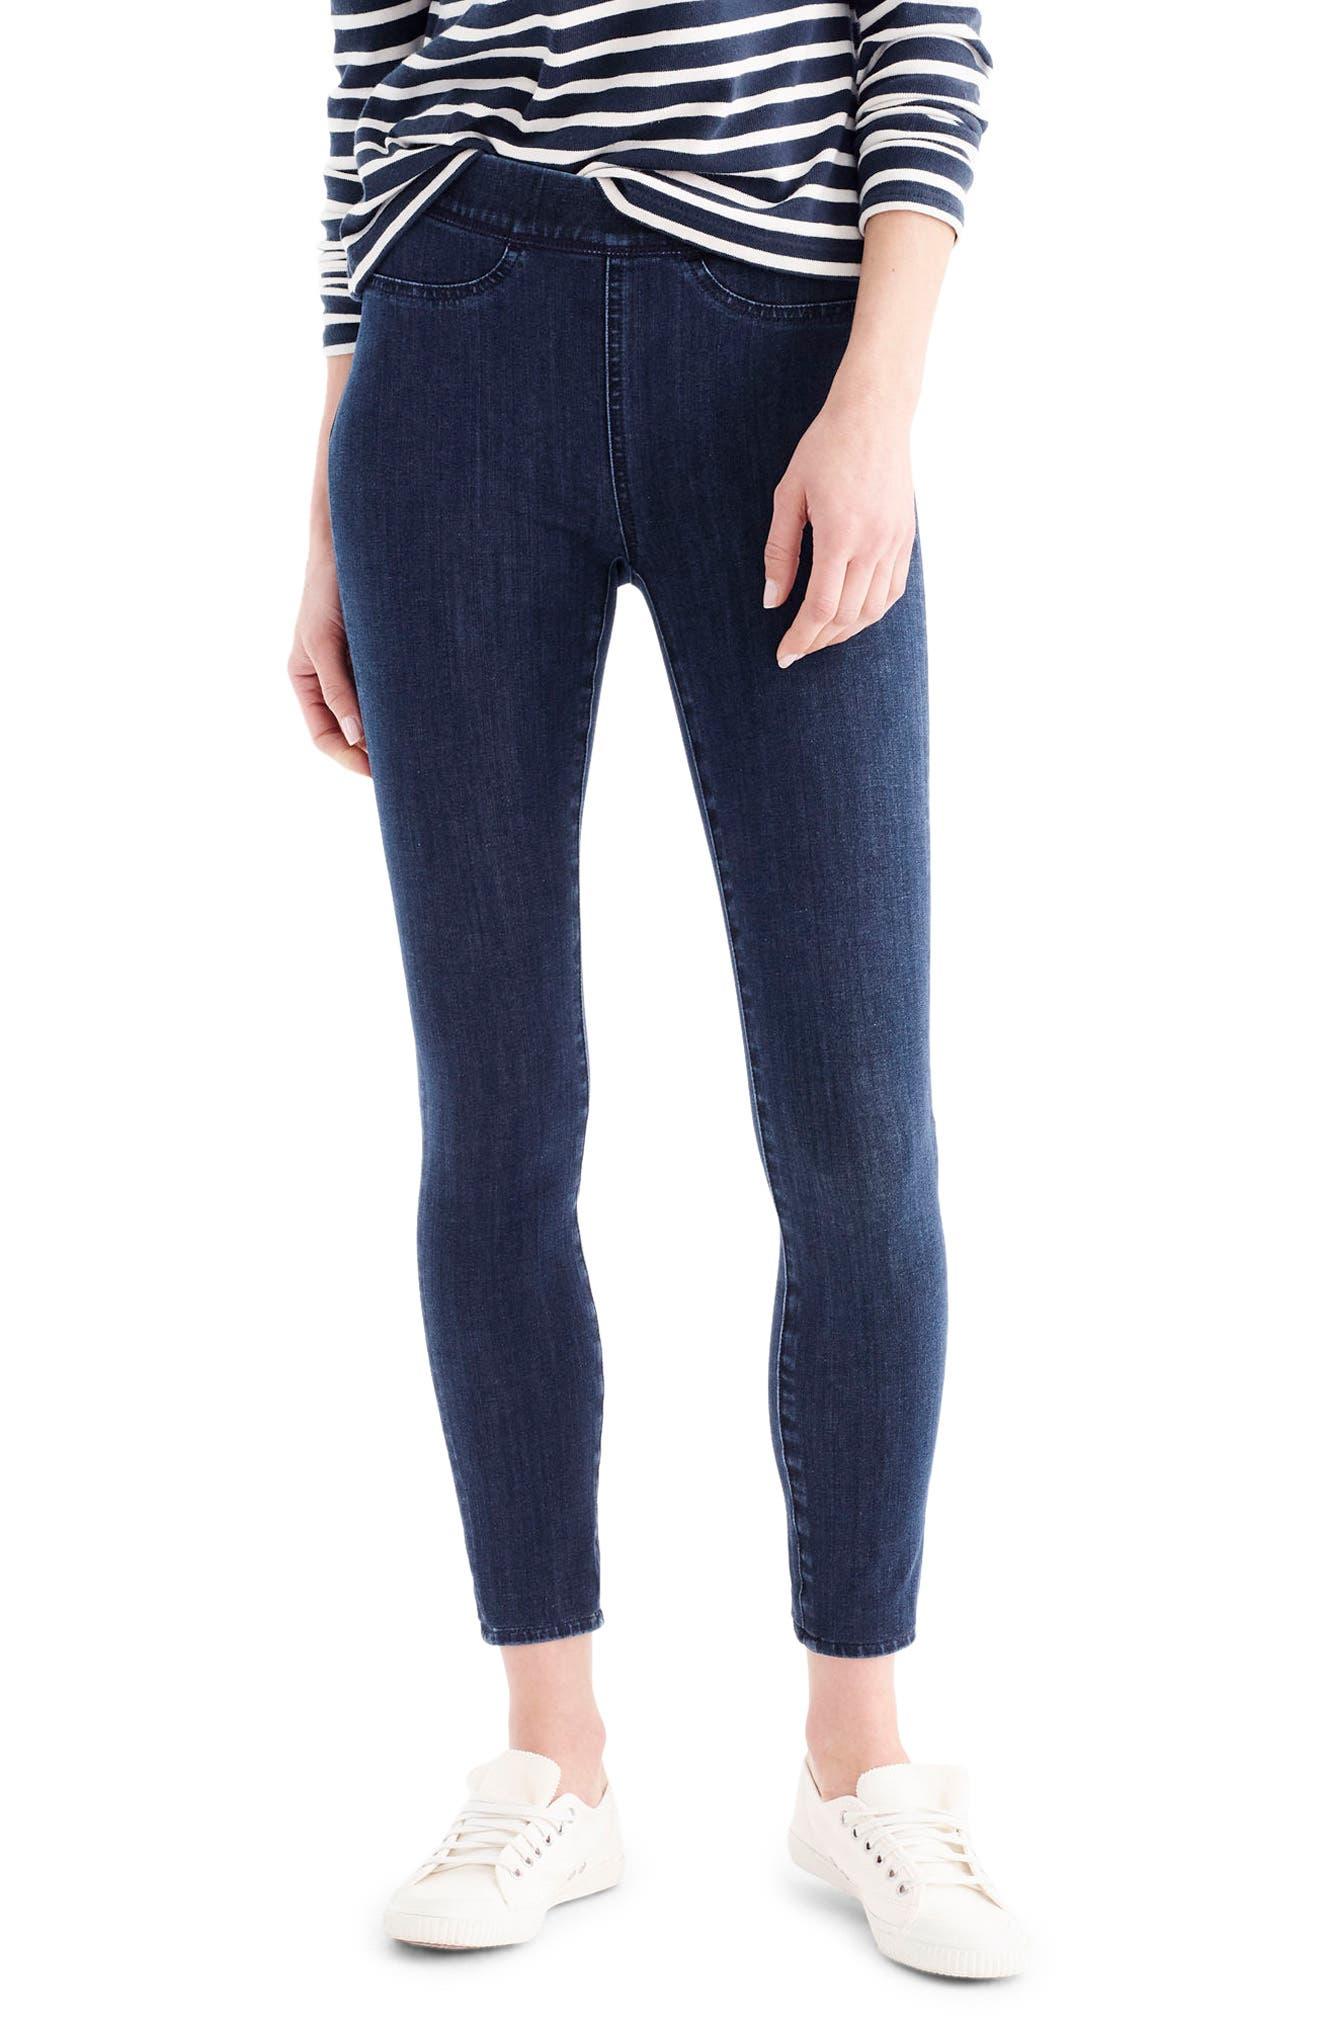 Main Image - J.Crew Pull-On Toothpick Indigo Jeans (Regular & Petite)